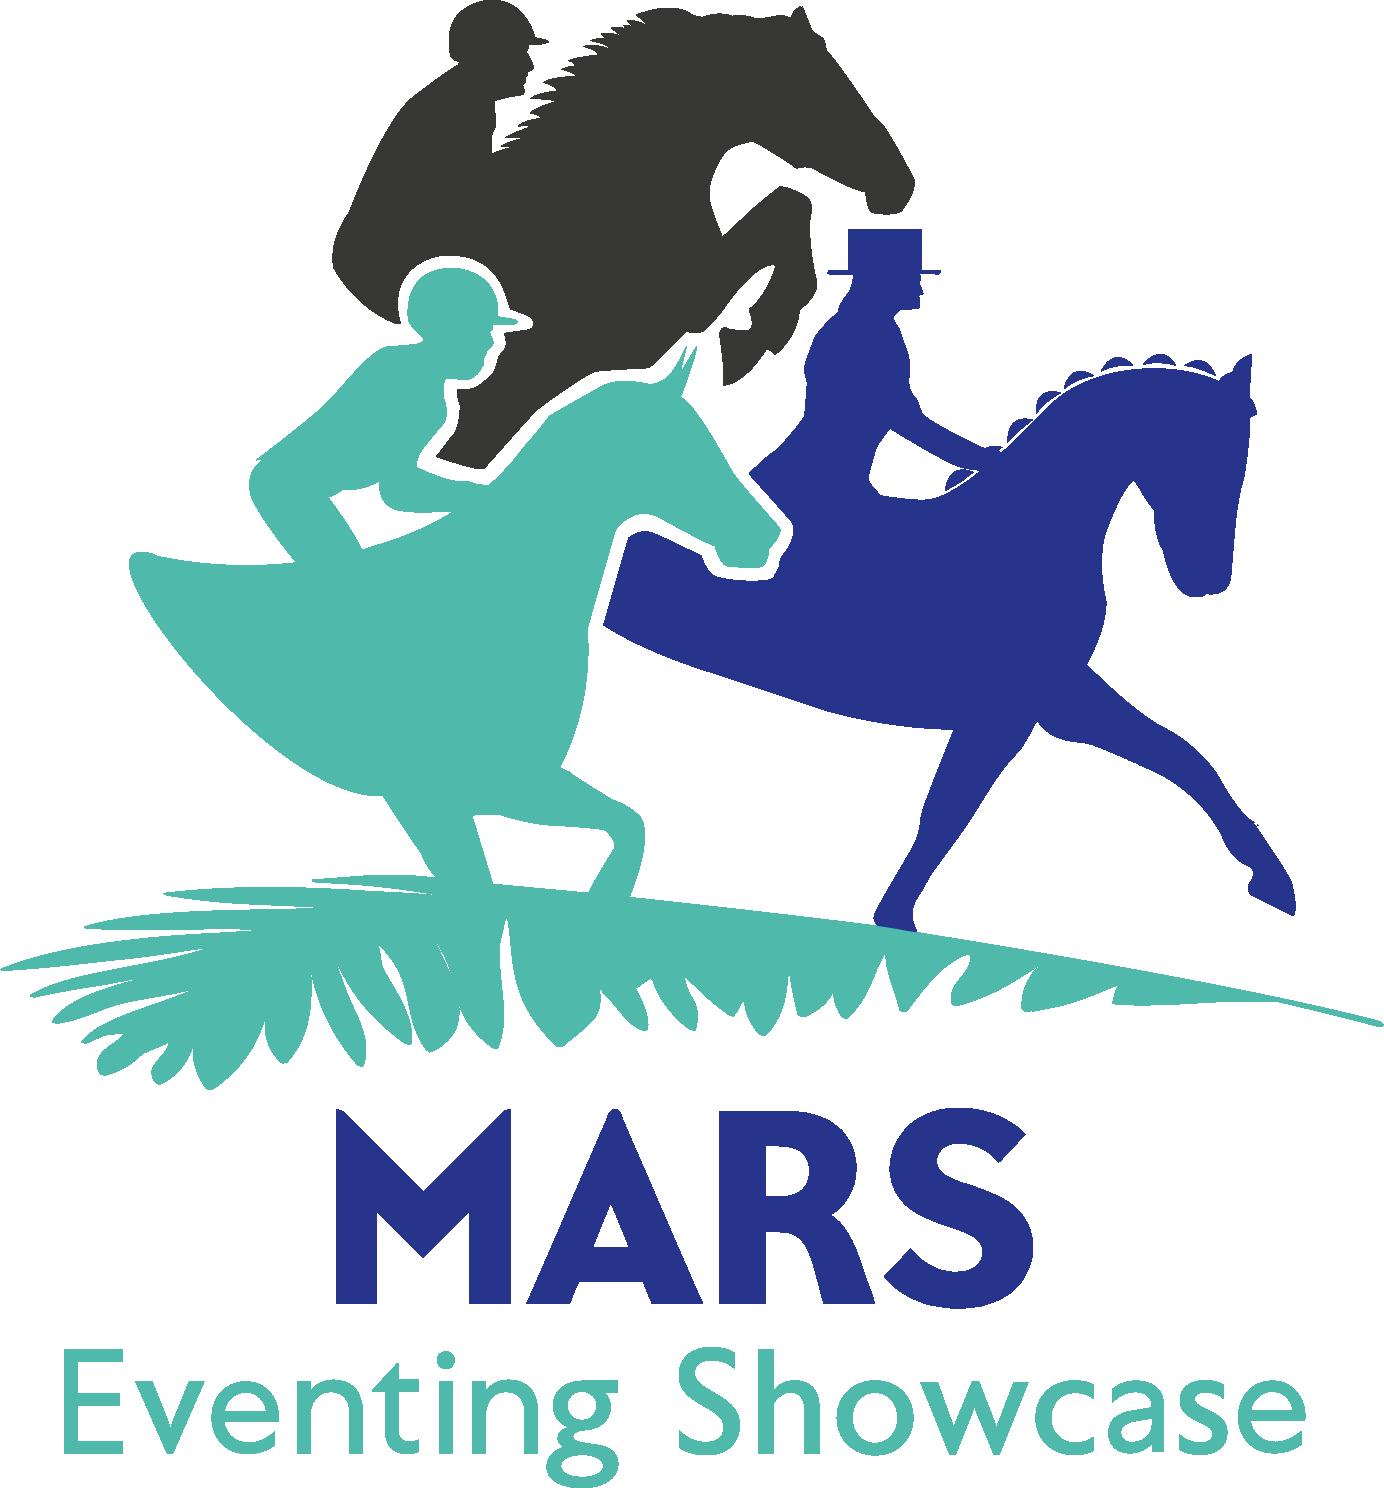 Mars Eventing Showcase Logo_CMYK